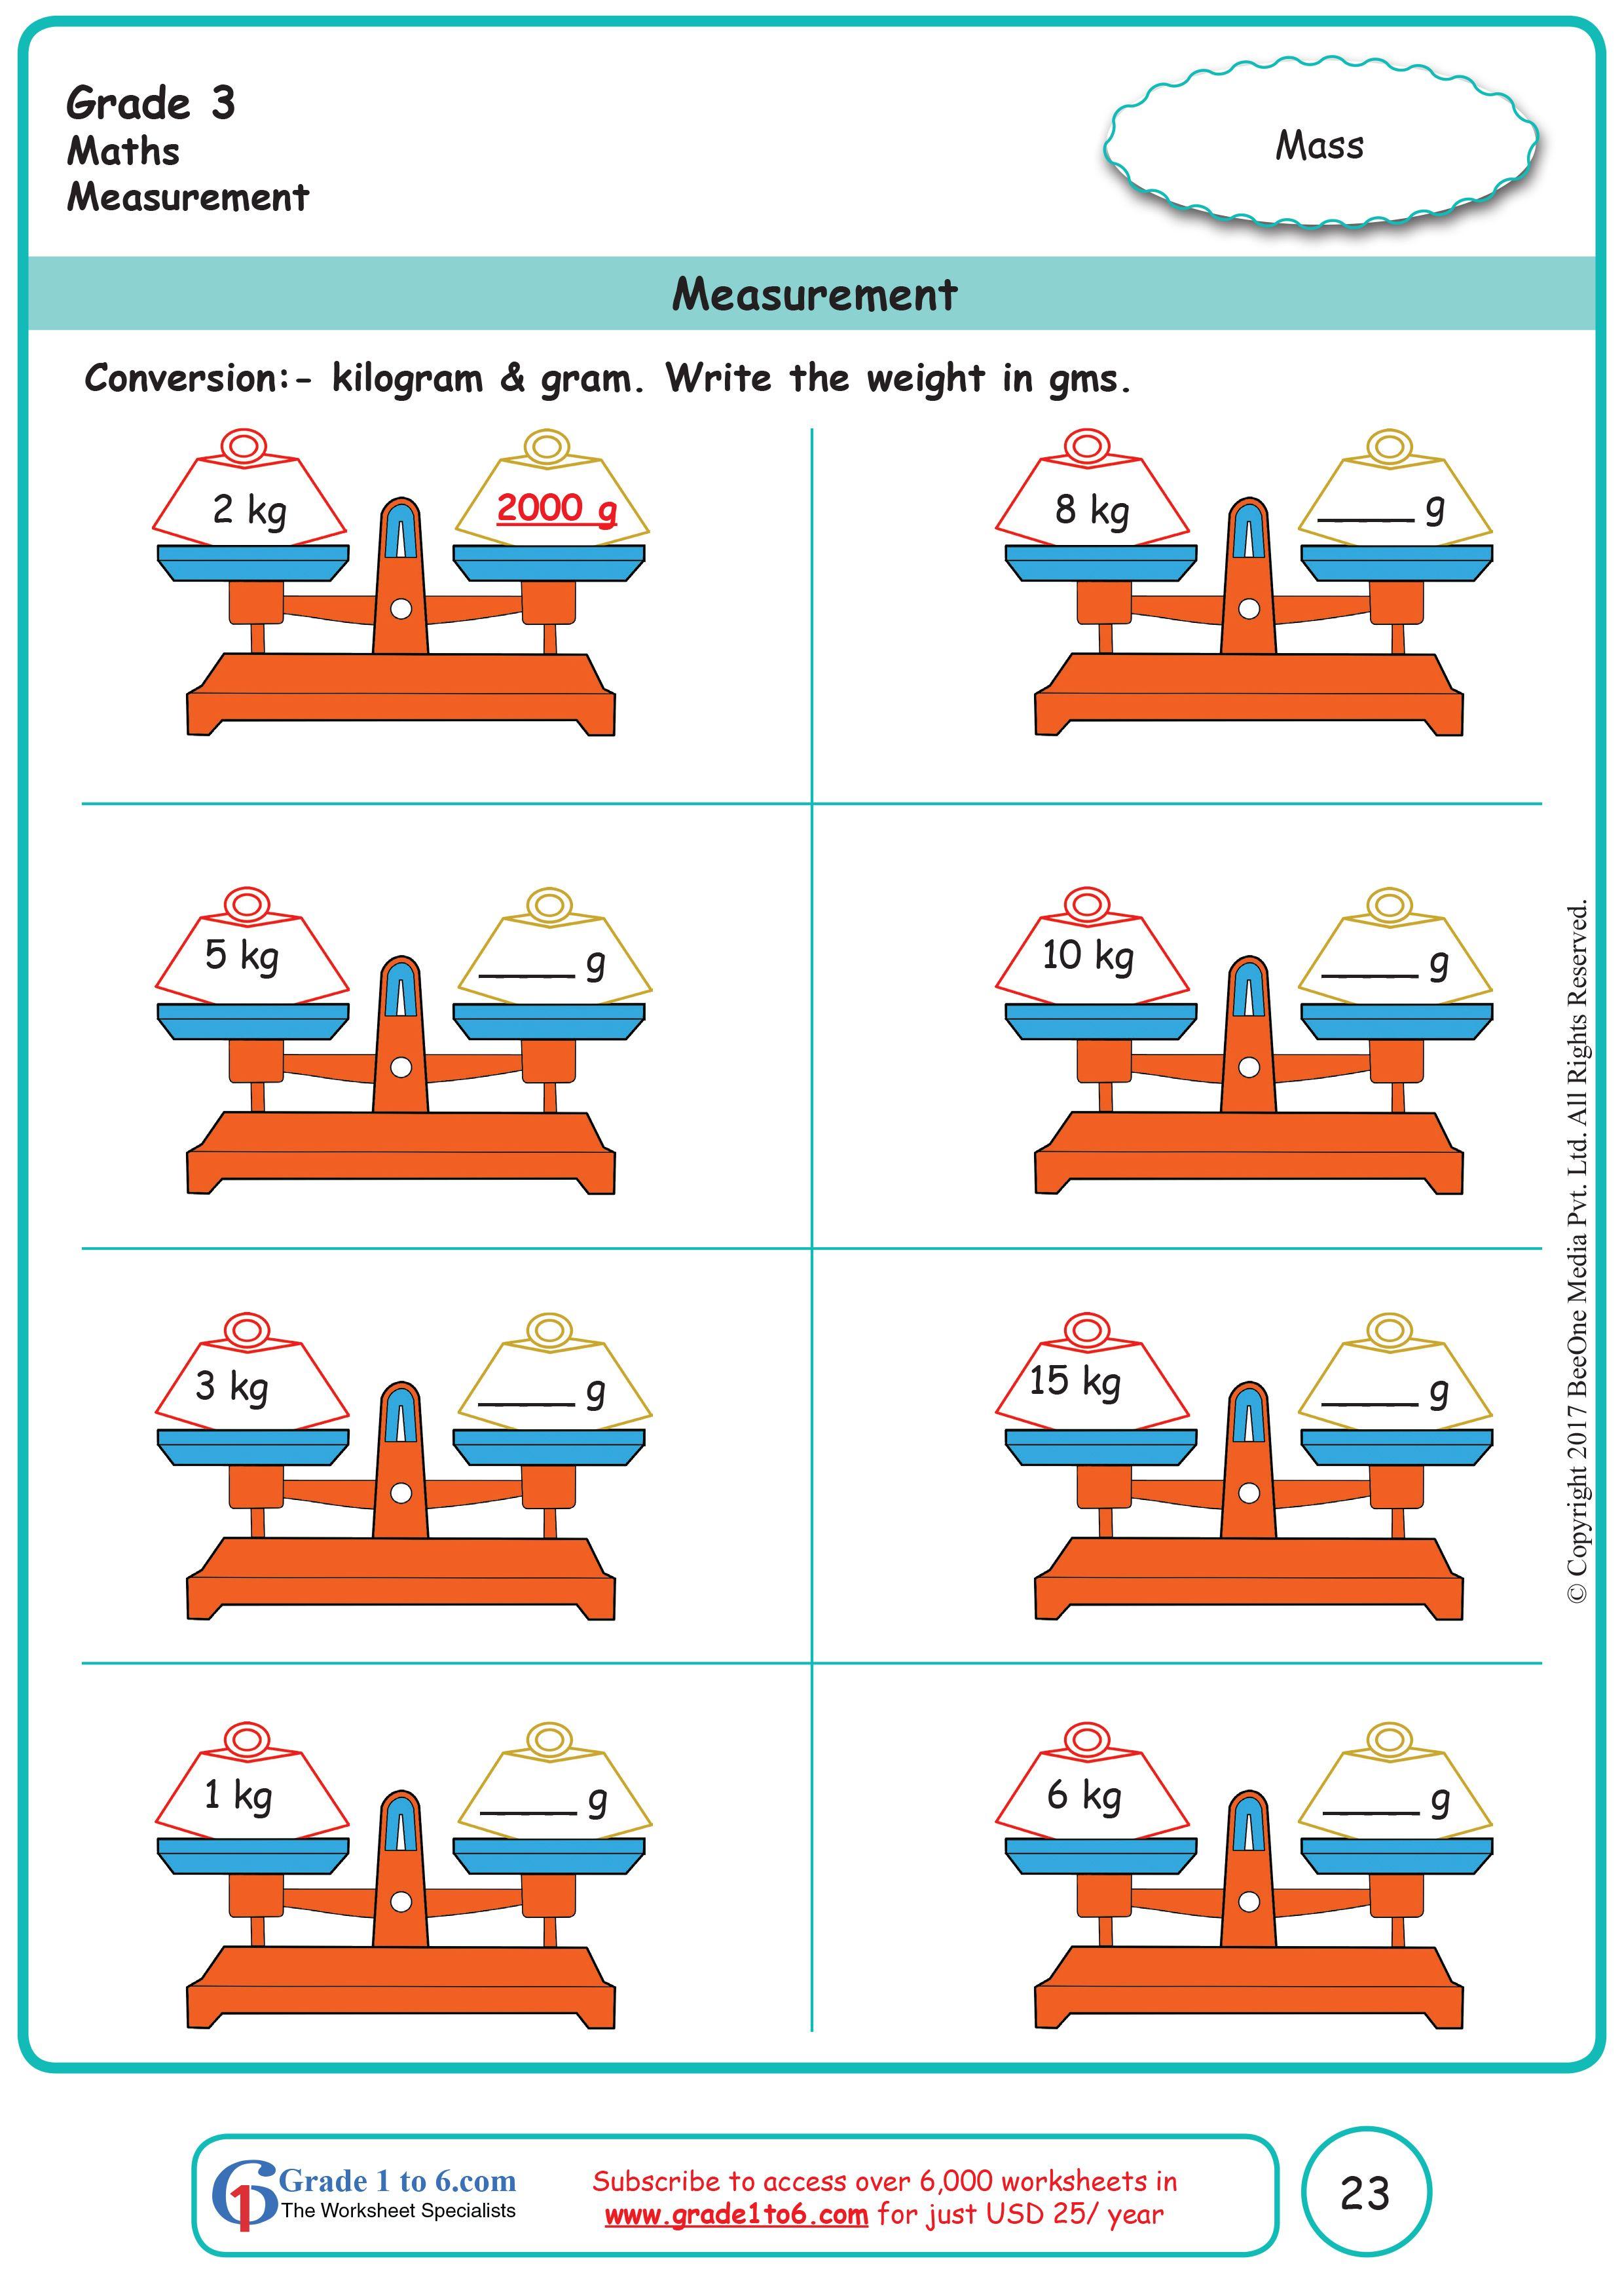 Measurement Grade 3 Math